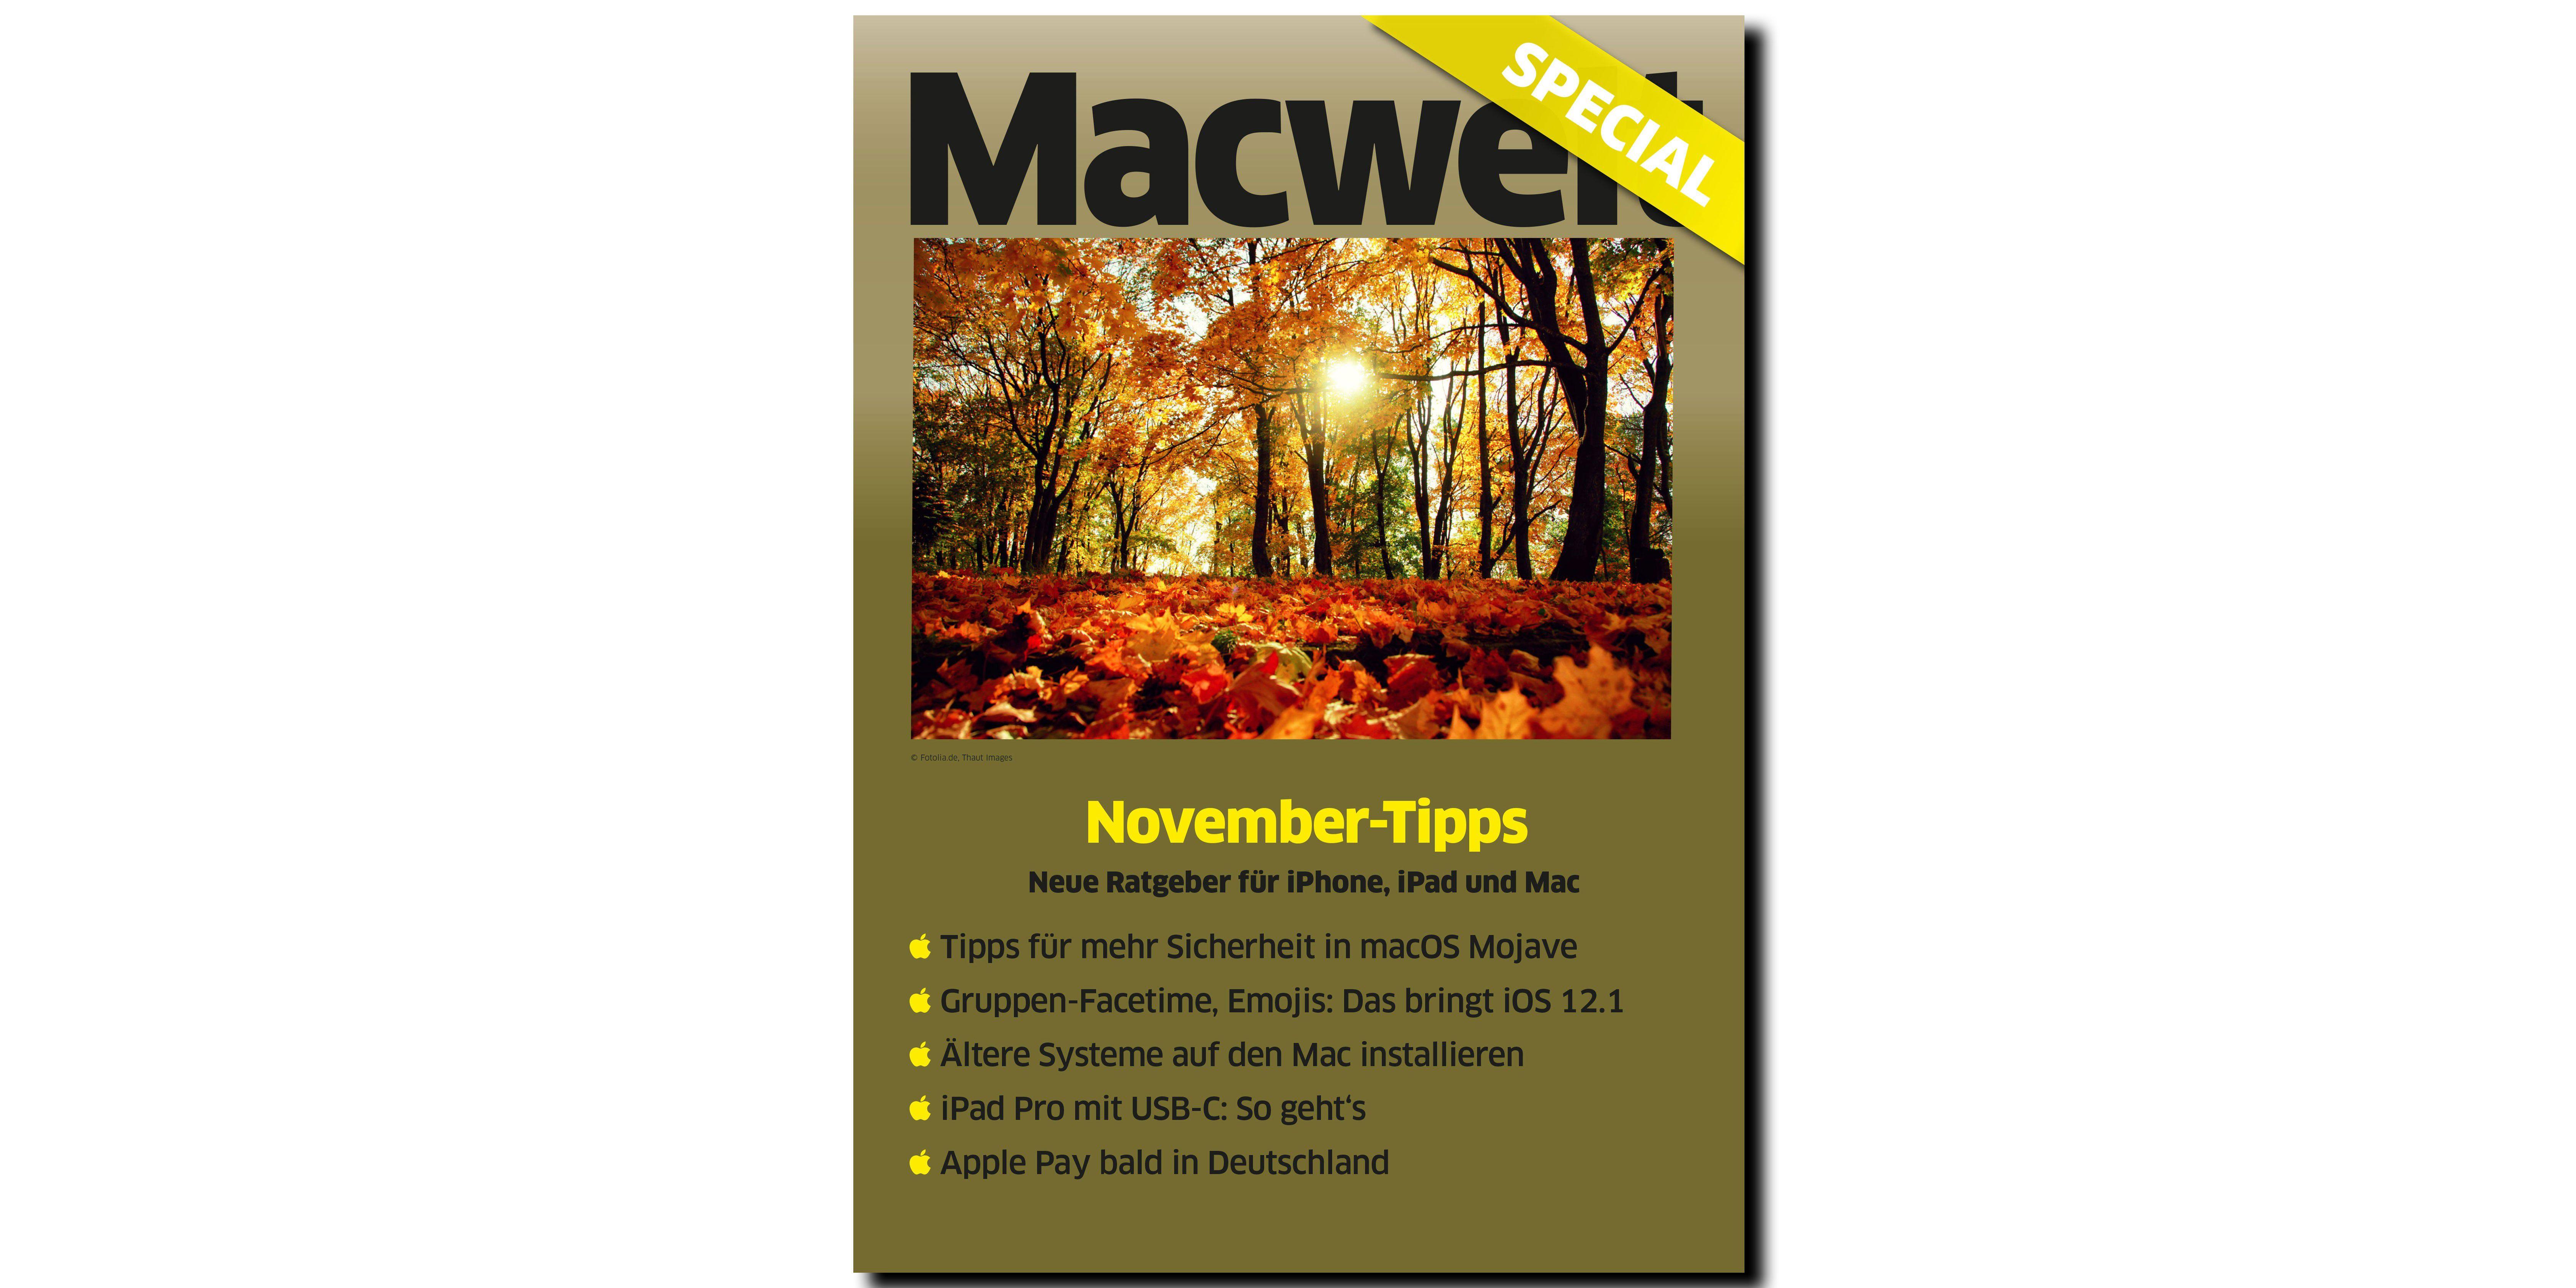 b55d7461b9ec Neues Special  November-Tipps - Macwelt